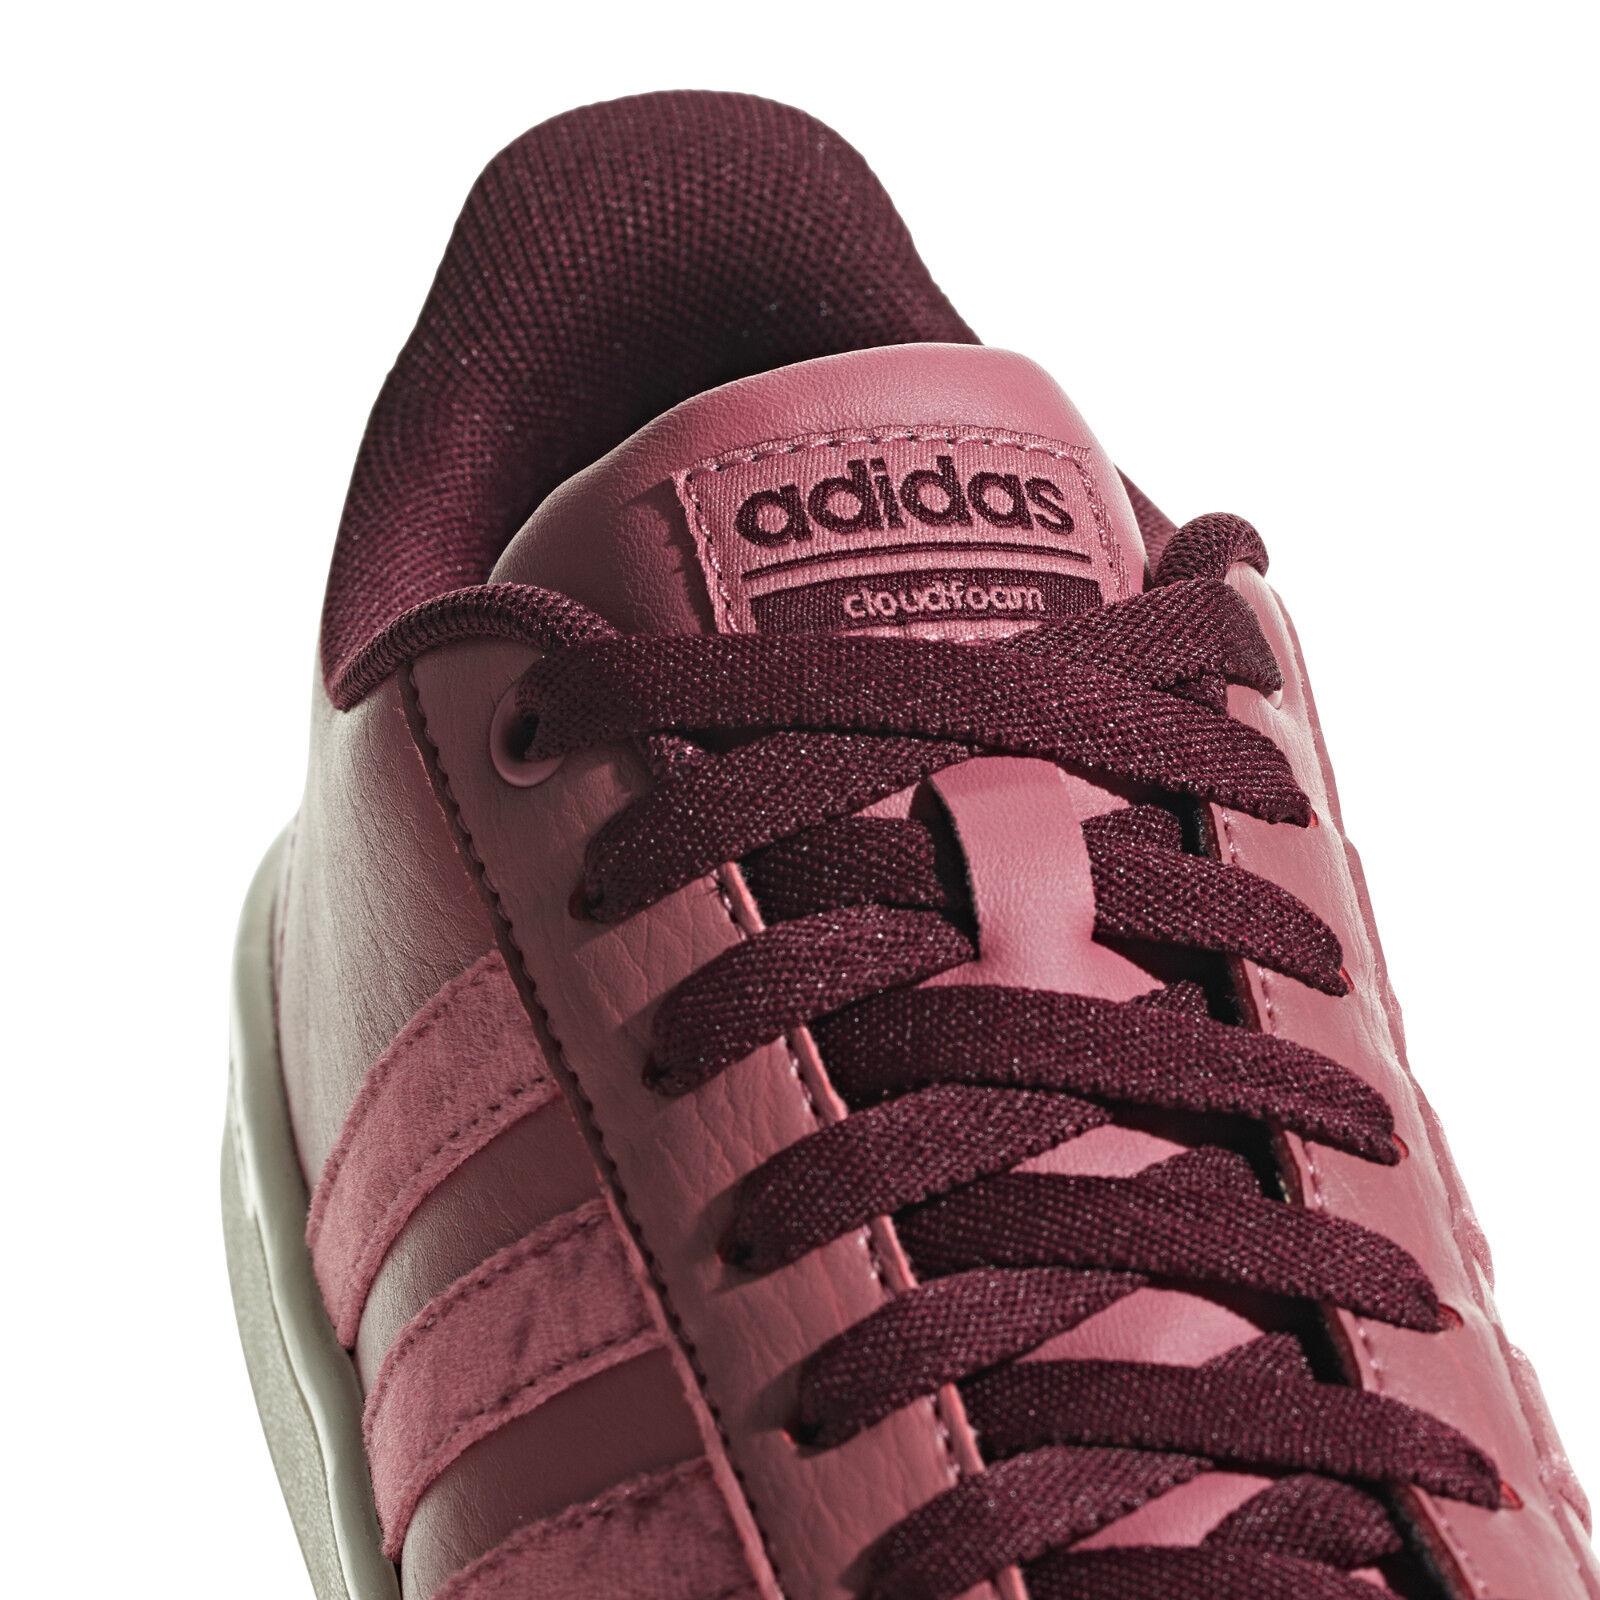 Adidas damen schuhe Casual Turnschuhe Fashion Fashion Fashion Cloudfoam Advantage Running BB7255 e8d3a2